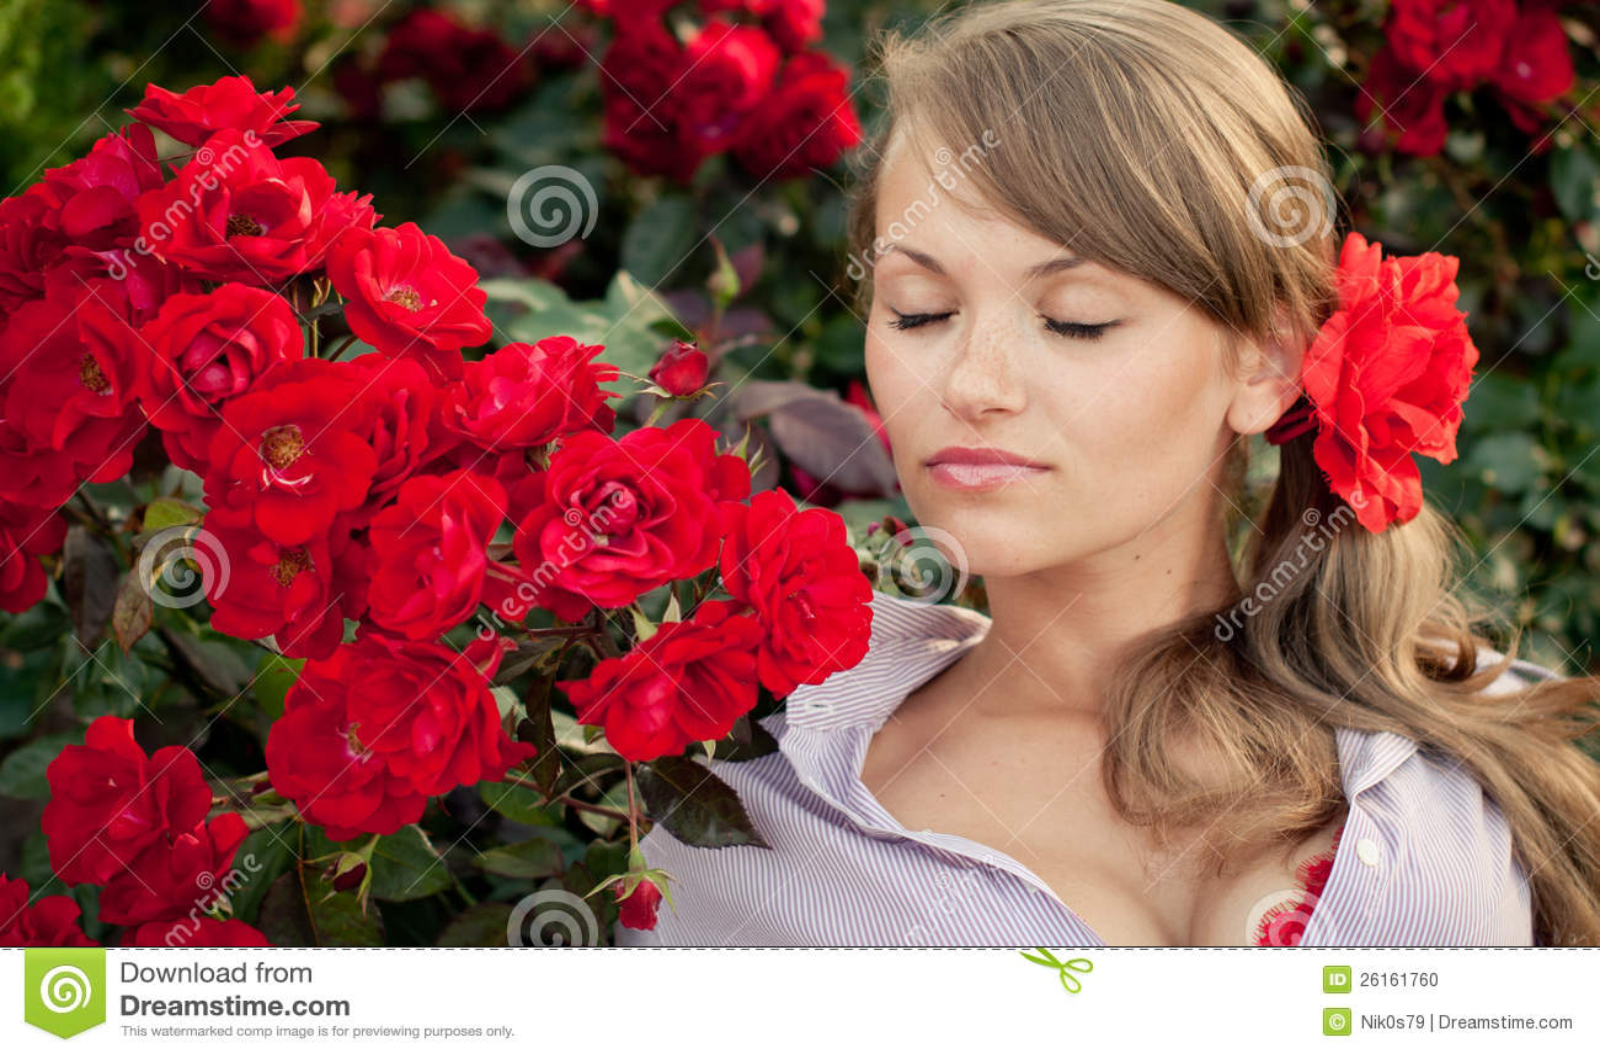 jardim rosas vermelhas:Woman Smelling Roses in a Garden